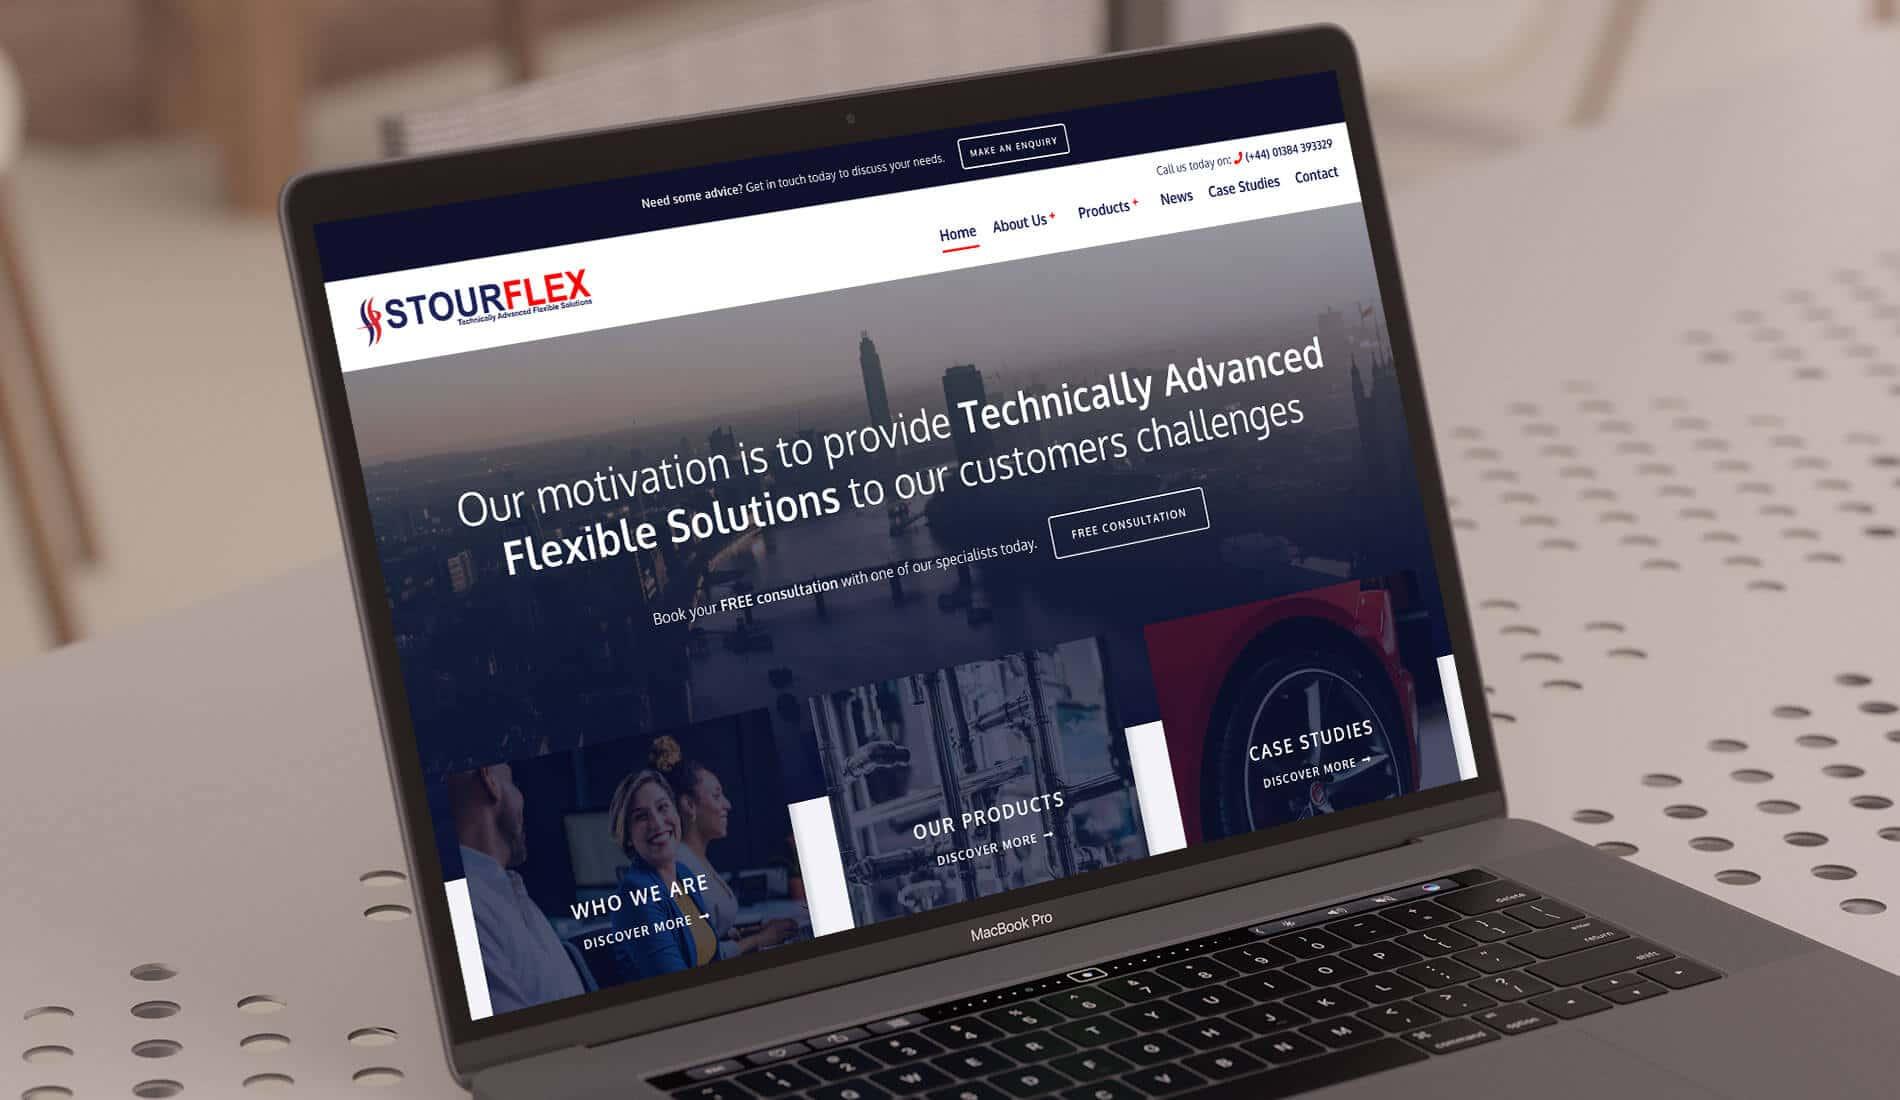 Stourflex website on mackbook pro